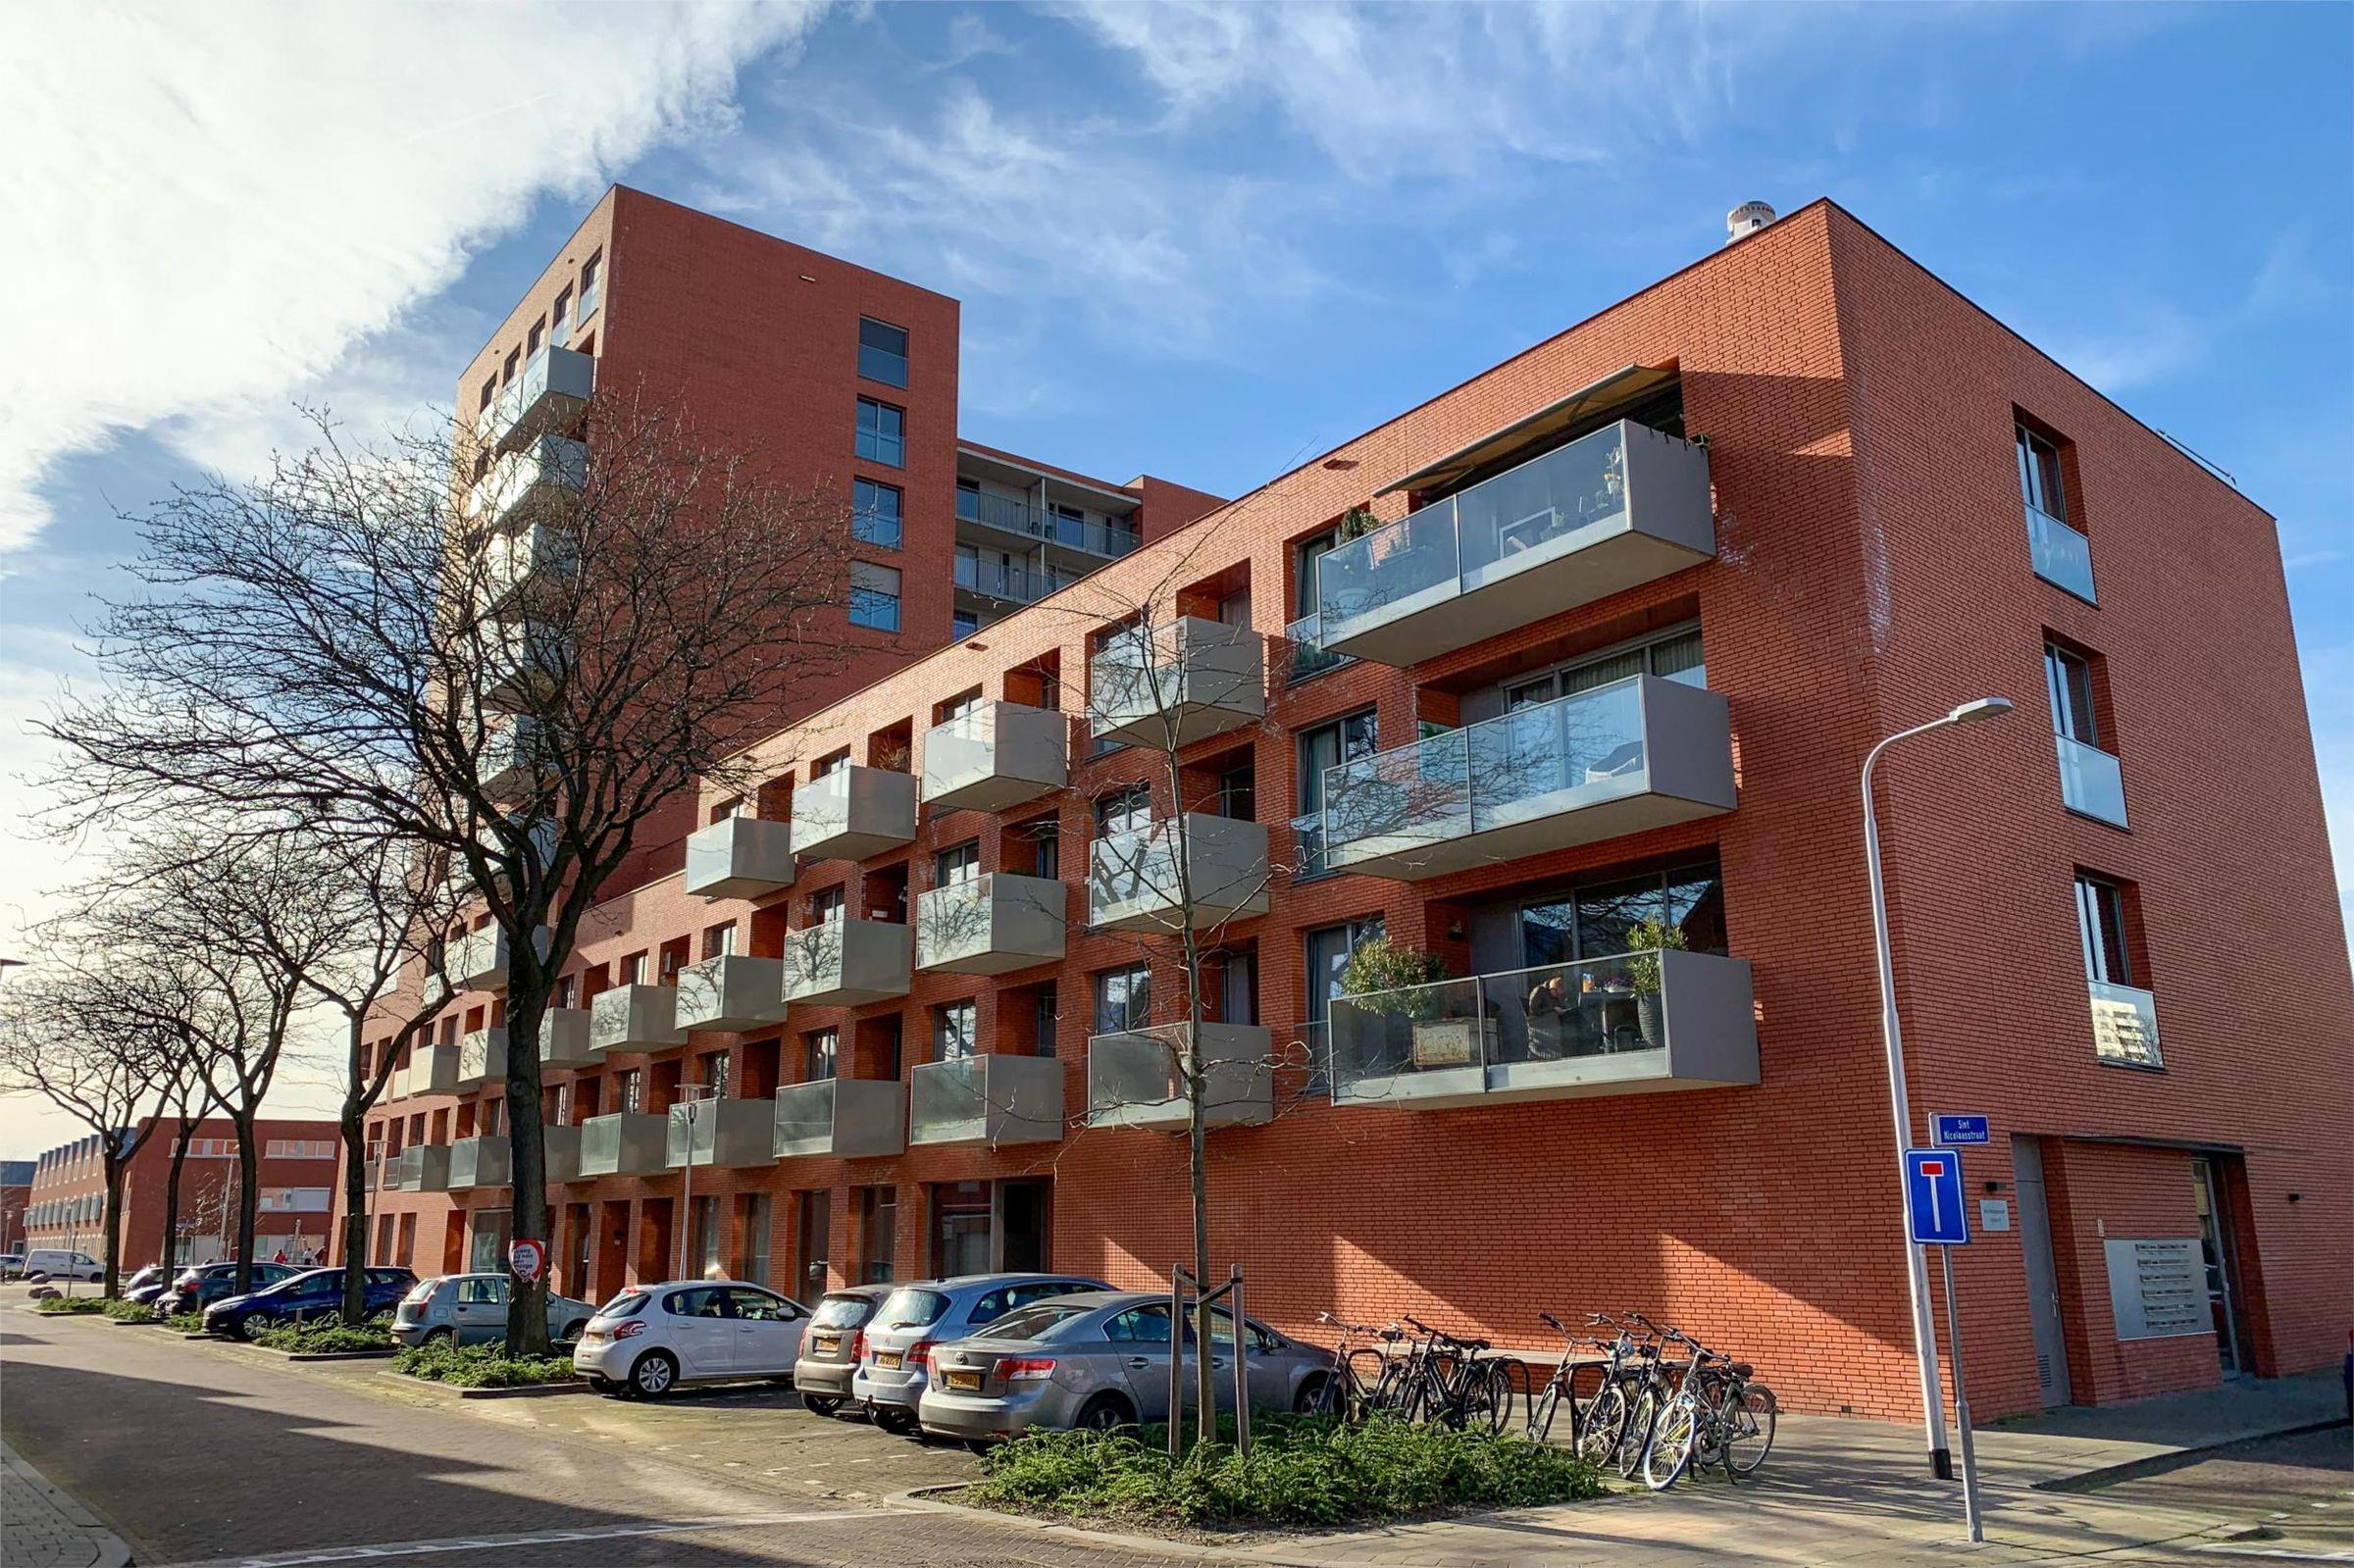 Sint Nicolaasstraat 49, Tilburg